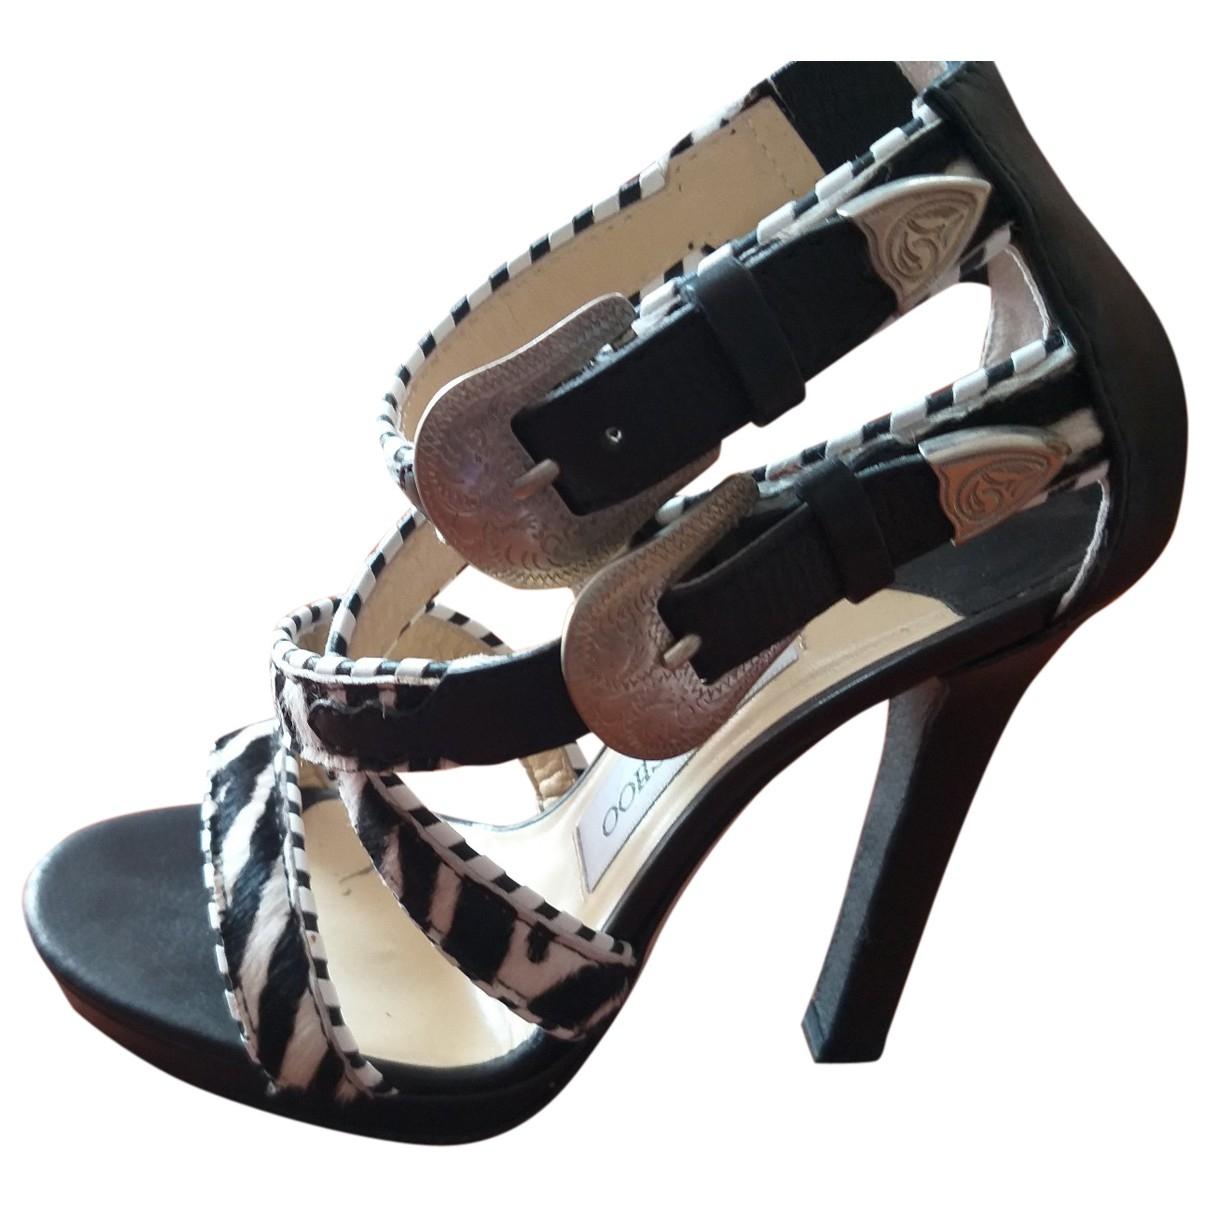 Jimmy Choo Lance Black Pony-style calfskin Sandals for Women 36 EU